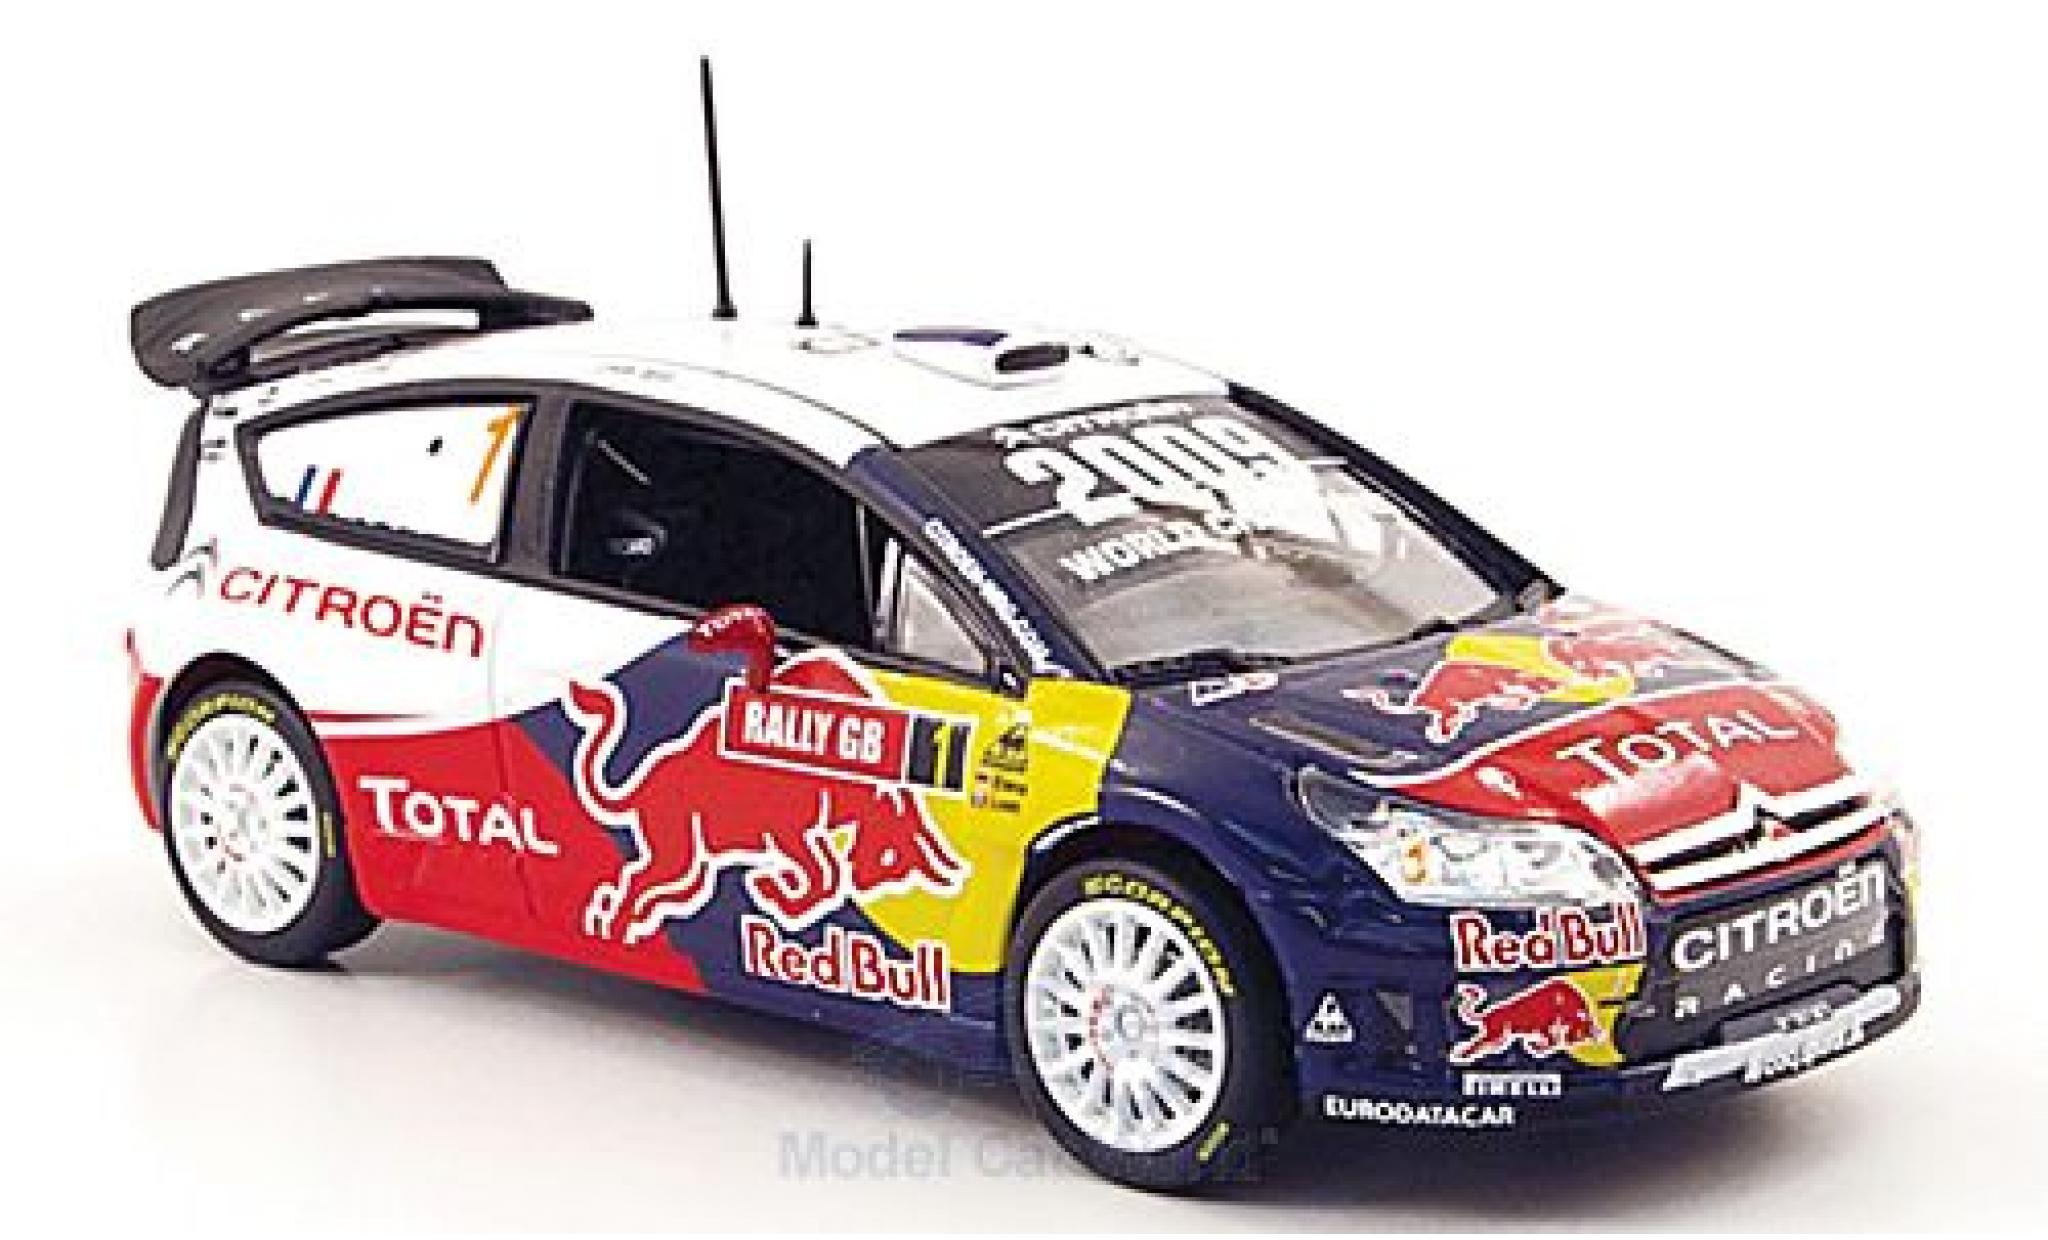 Citroen C4 WRC 1/43 Norev No.1 Racing Red Bull Total Rally GB 2009 S.Loeb/D.Elena